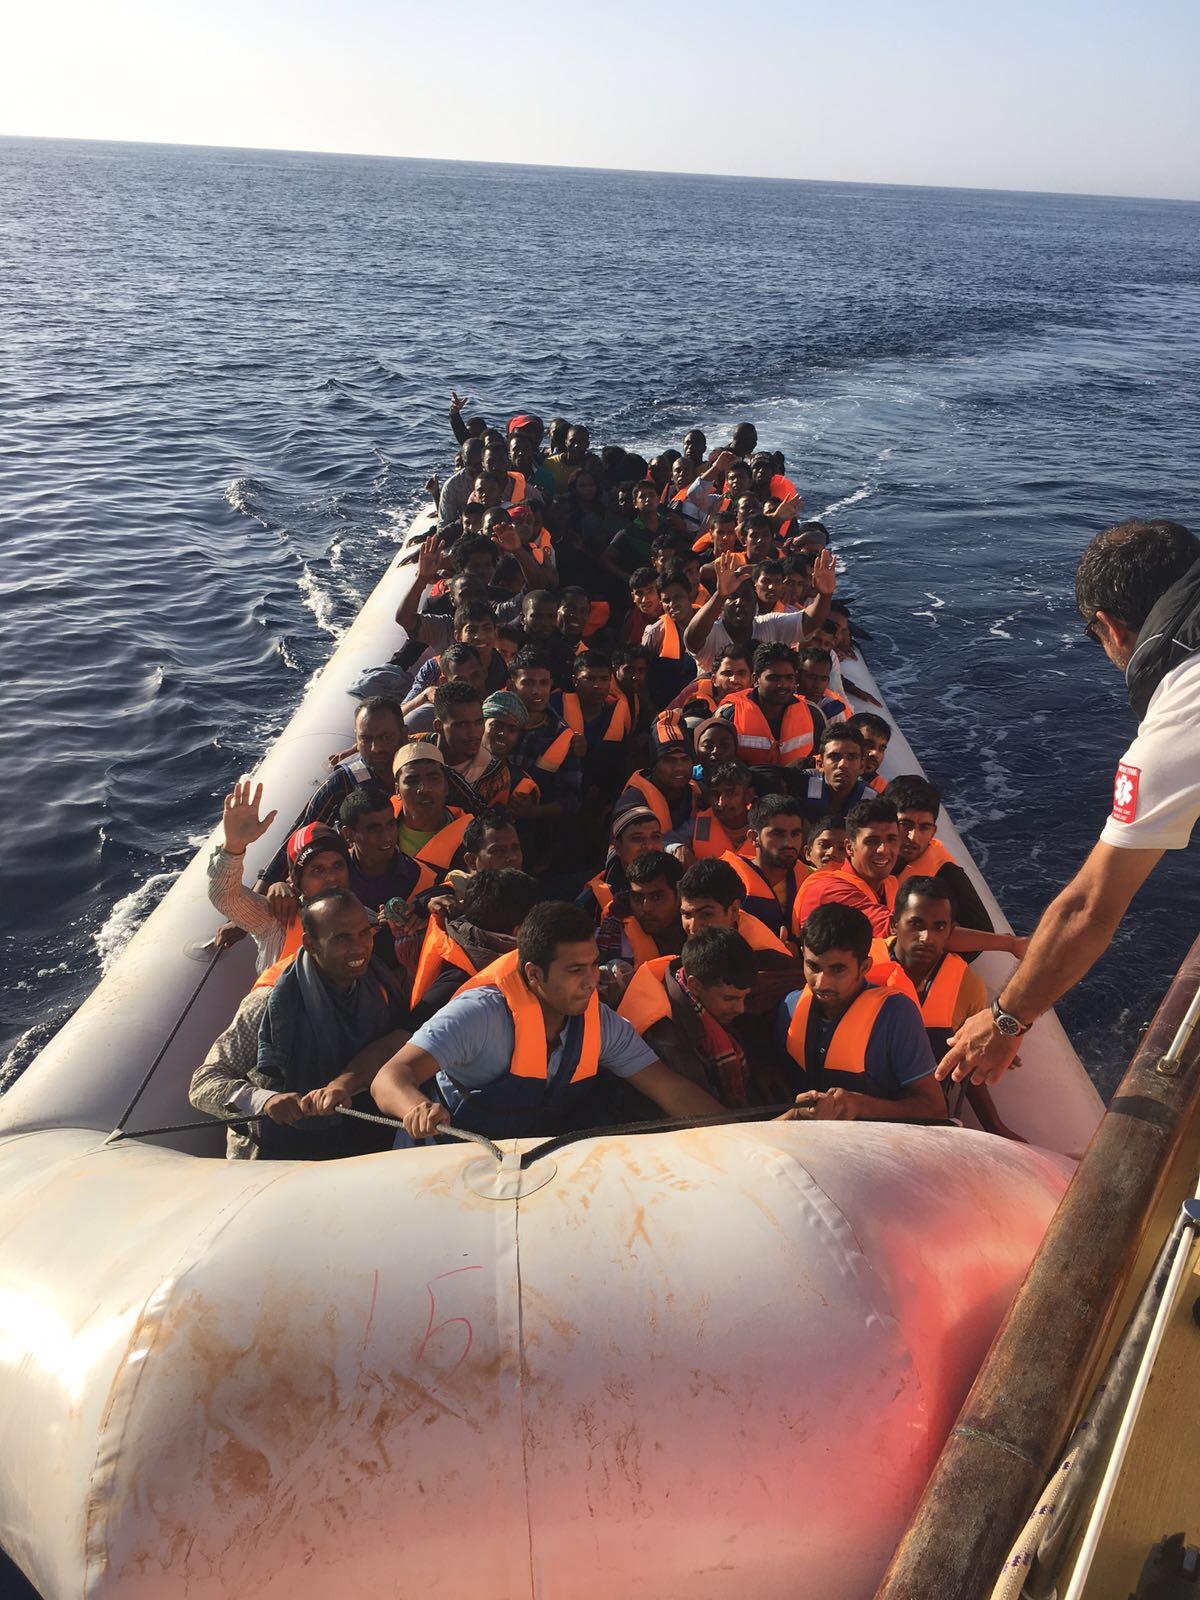 Spanish lifeguards save refugees